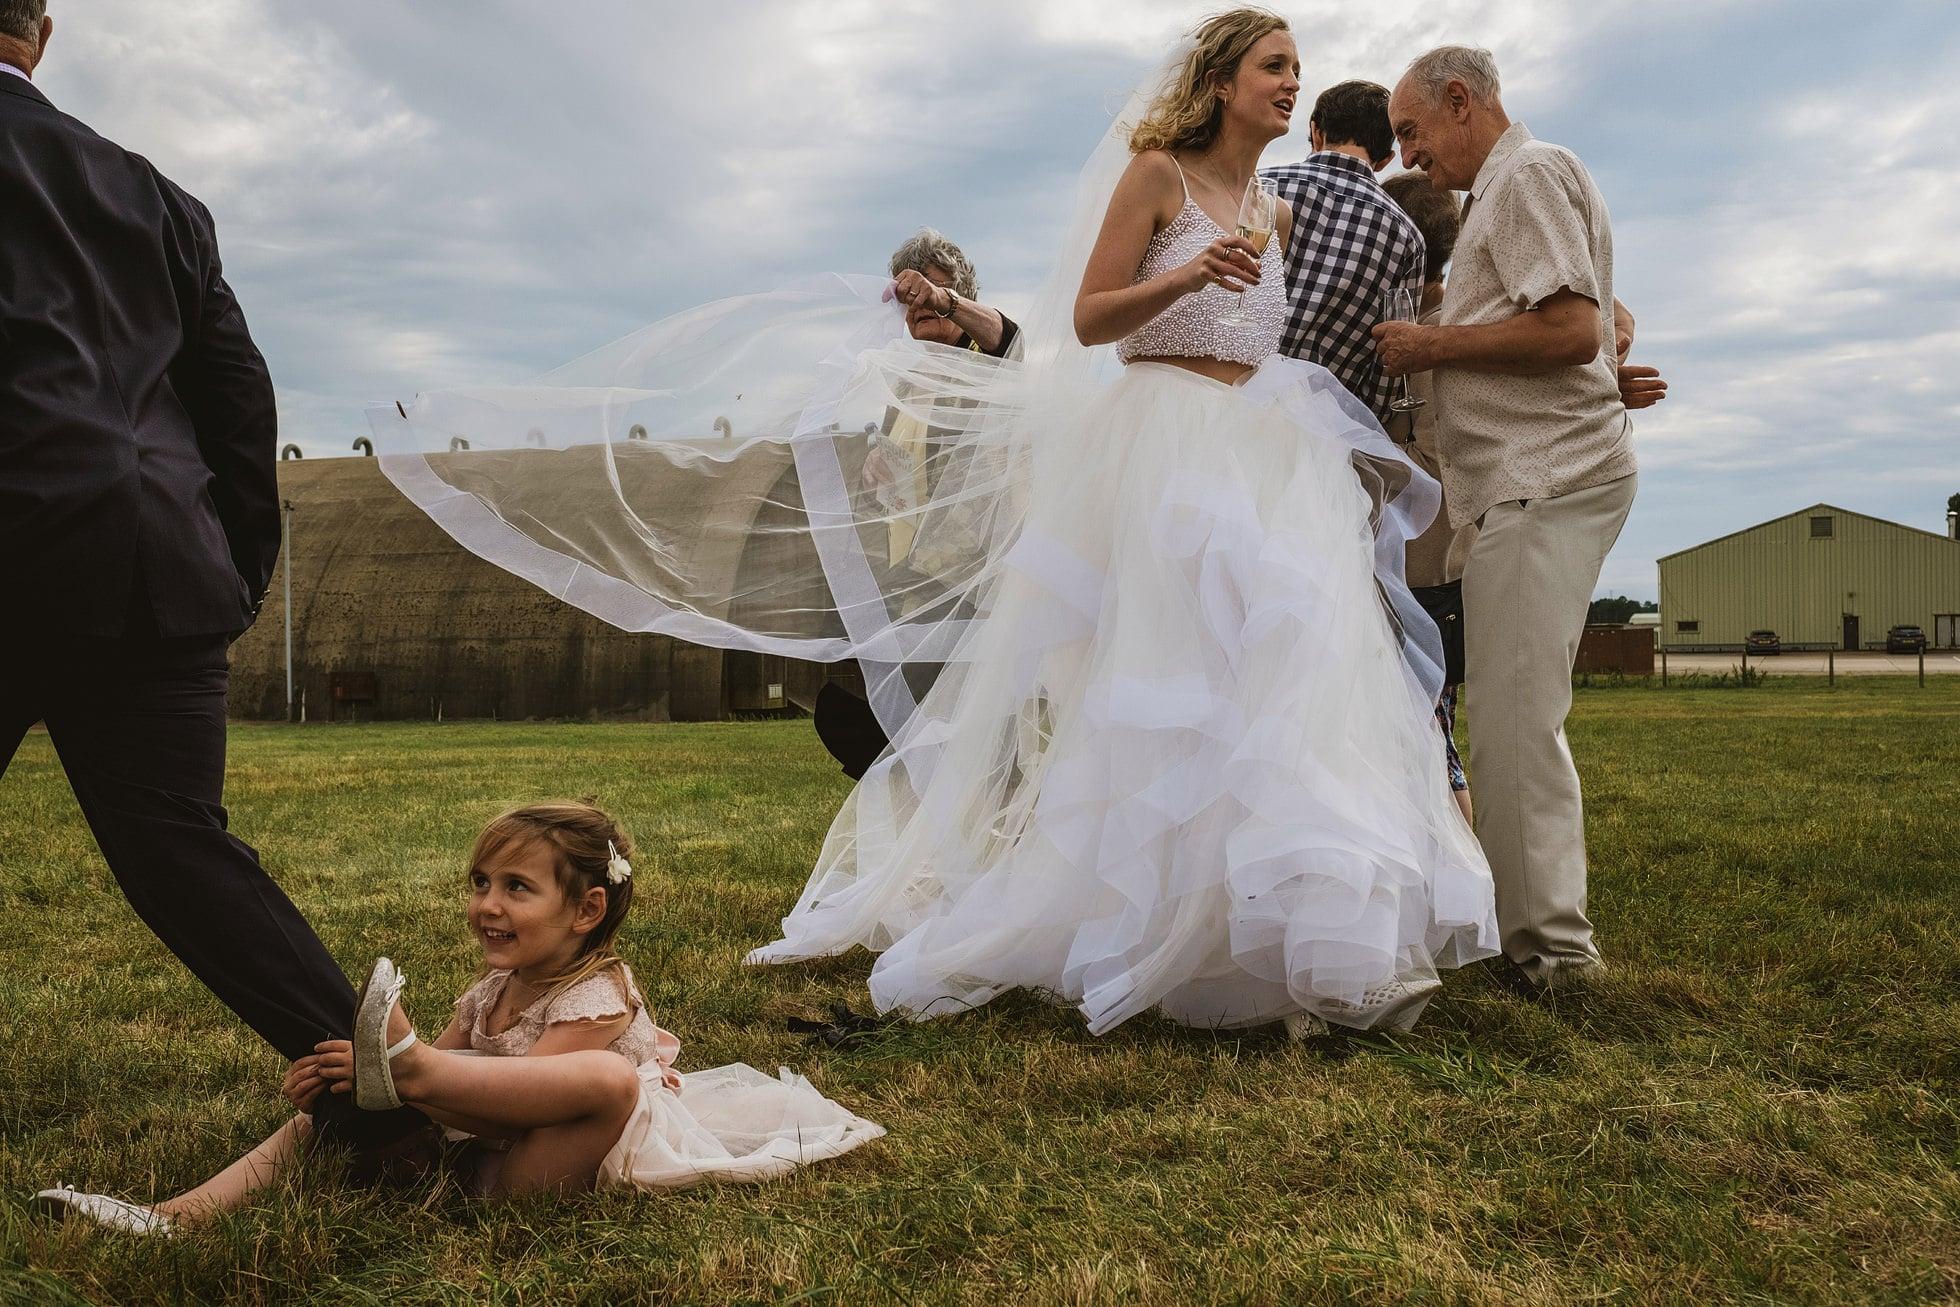 suffolk candid wedding photographer